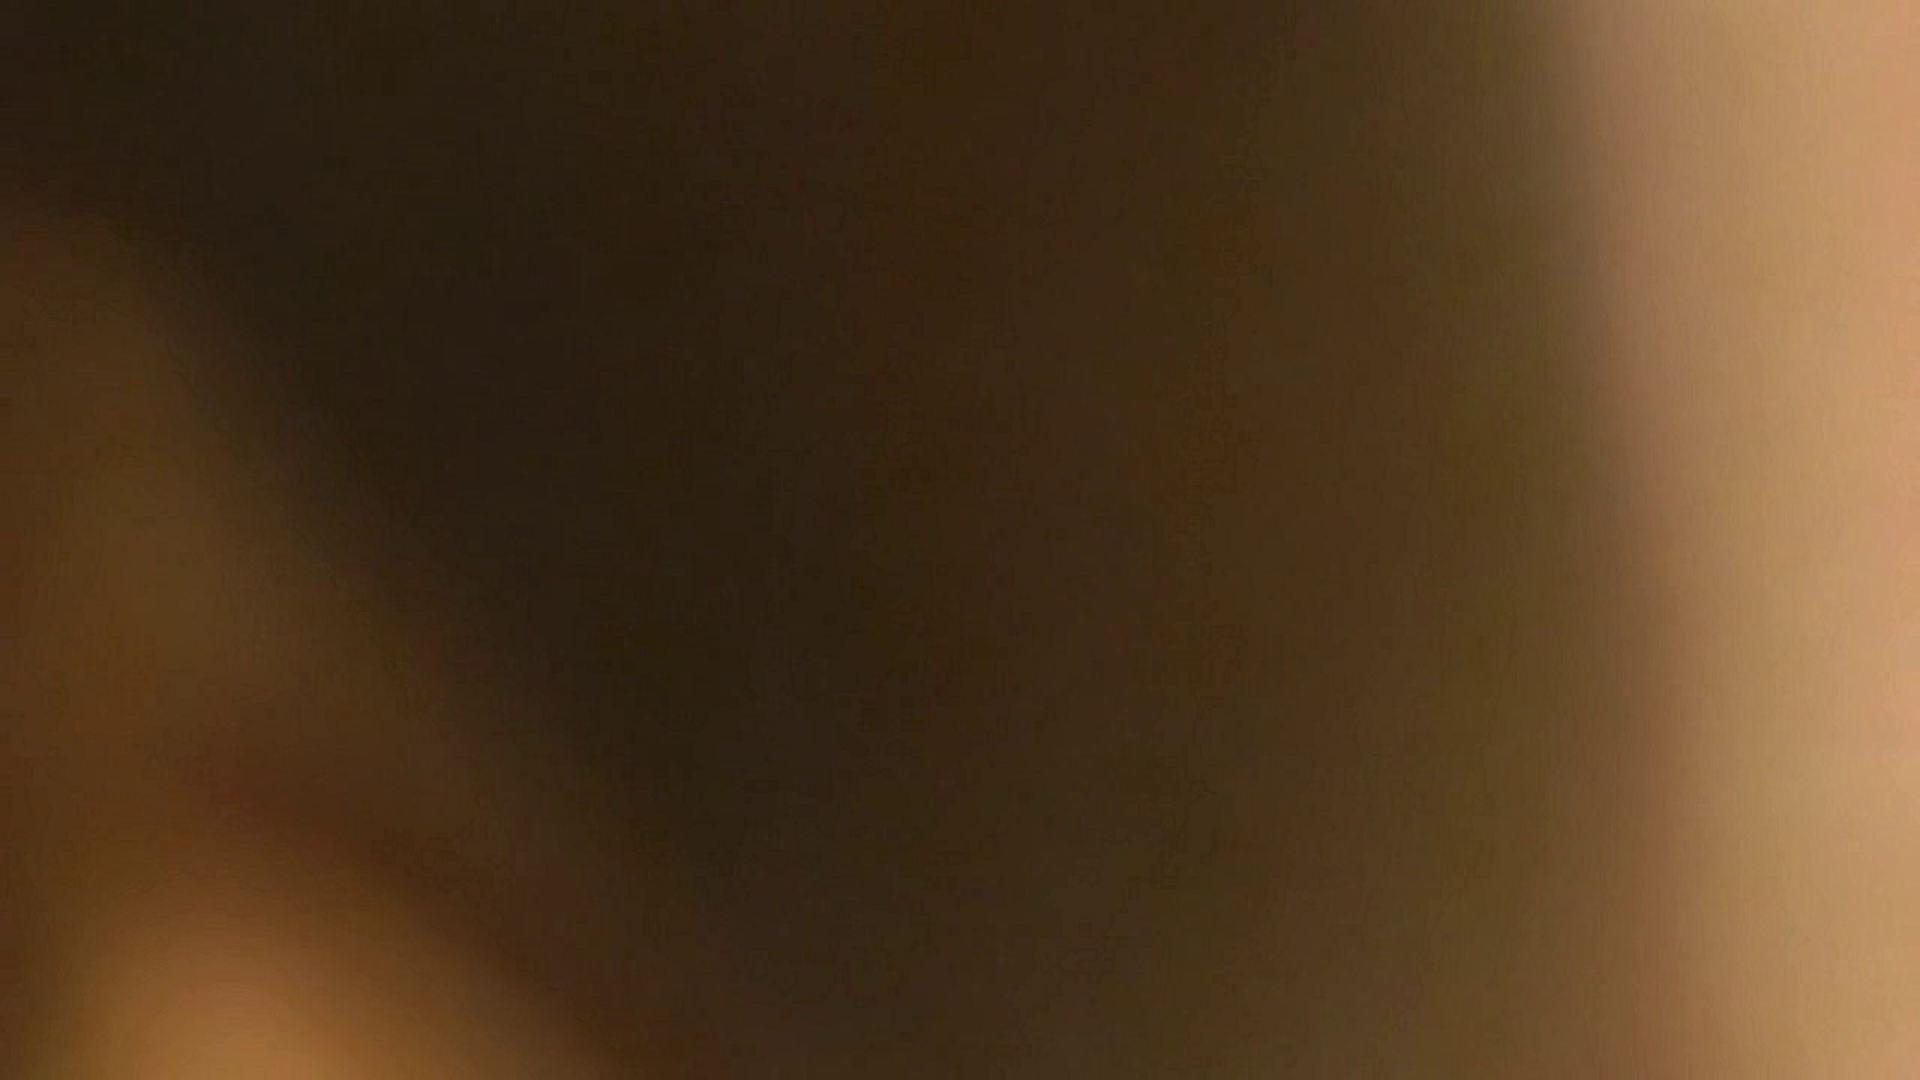 vol.1 Mayumi 窓越しに入浴シーン撮影に成功 入浴中の女性  57PIX 14